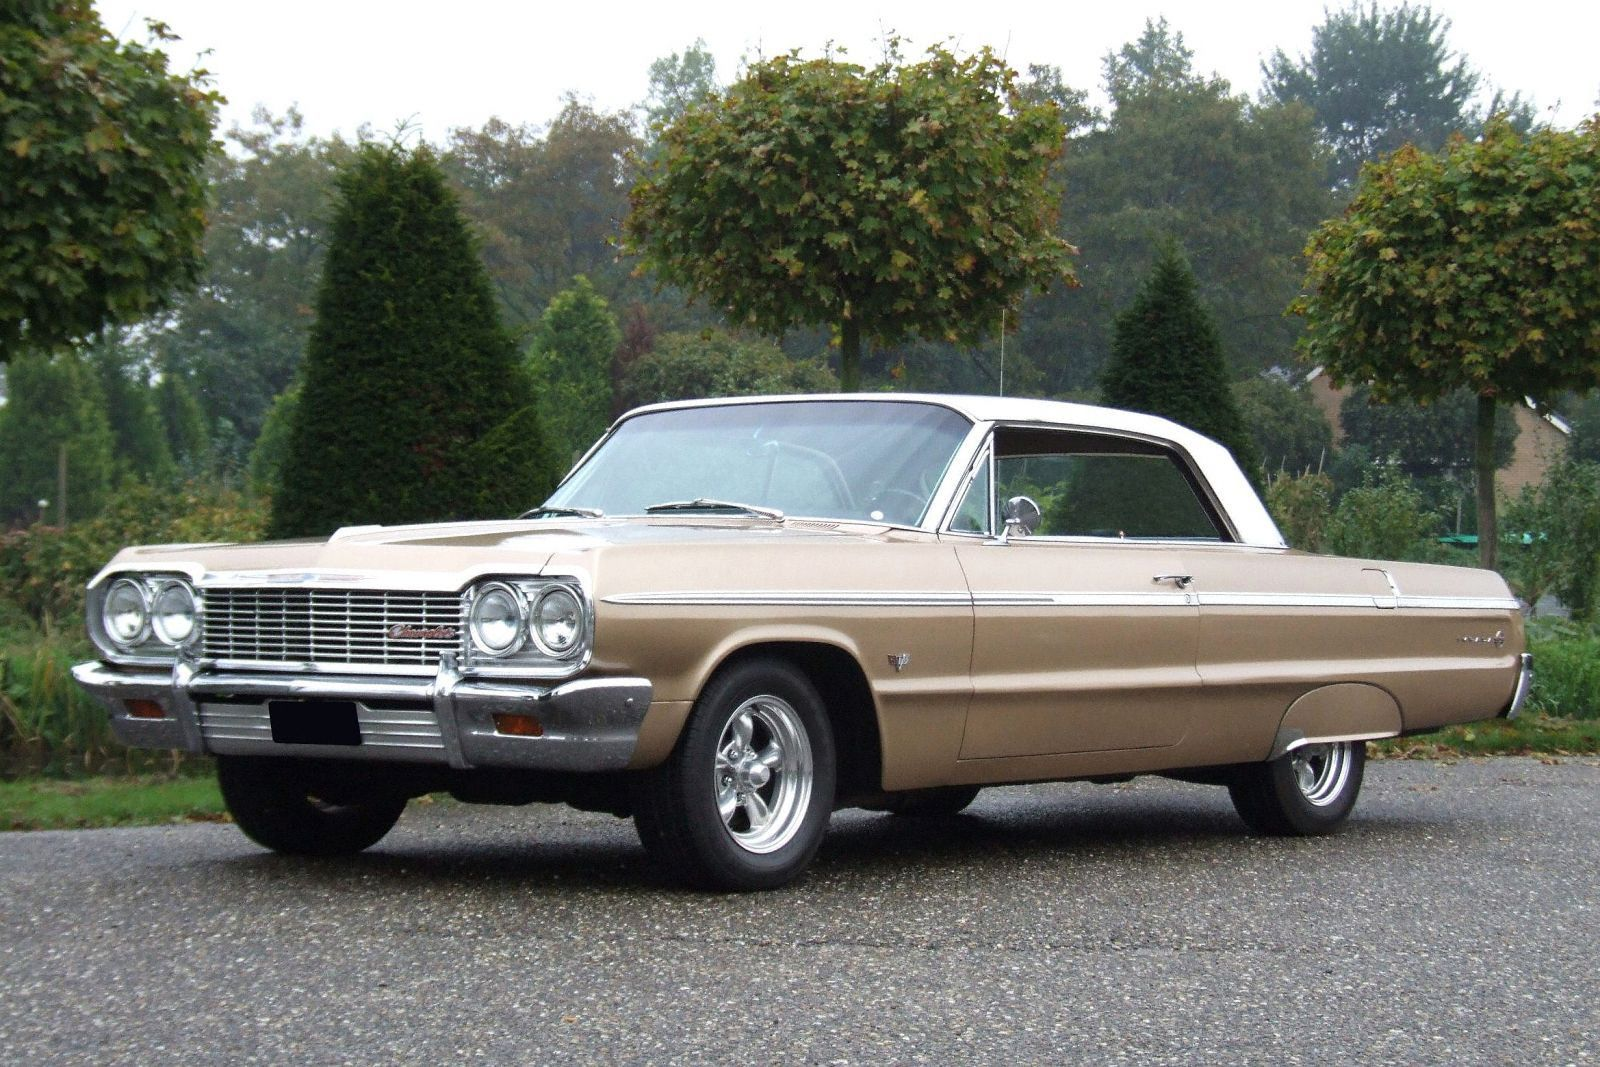 1964 Impala Chevrolet Impala Classic Cars Muscle Classic Cars